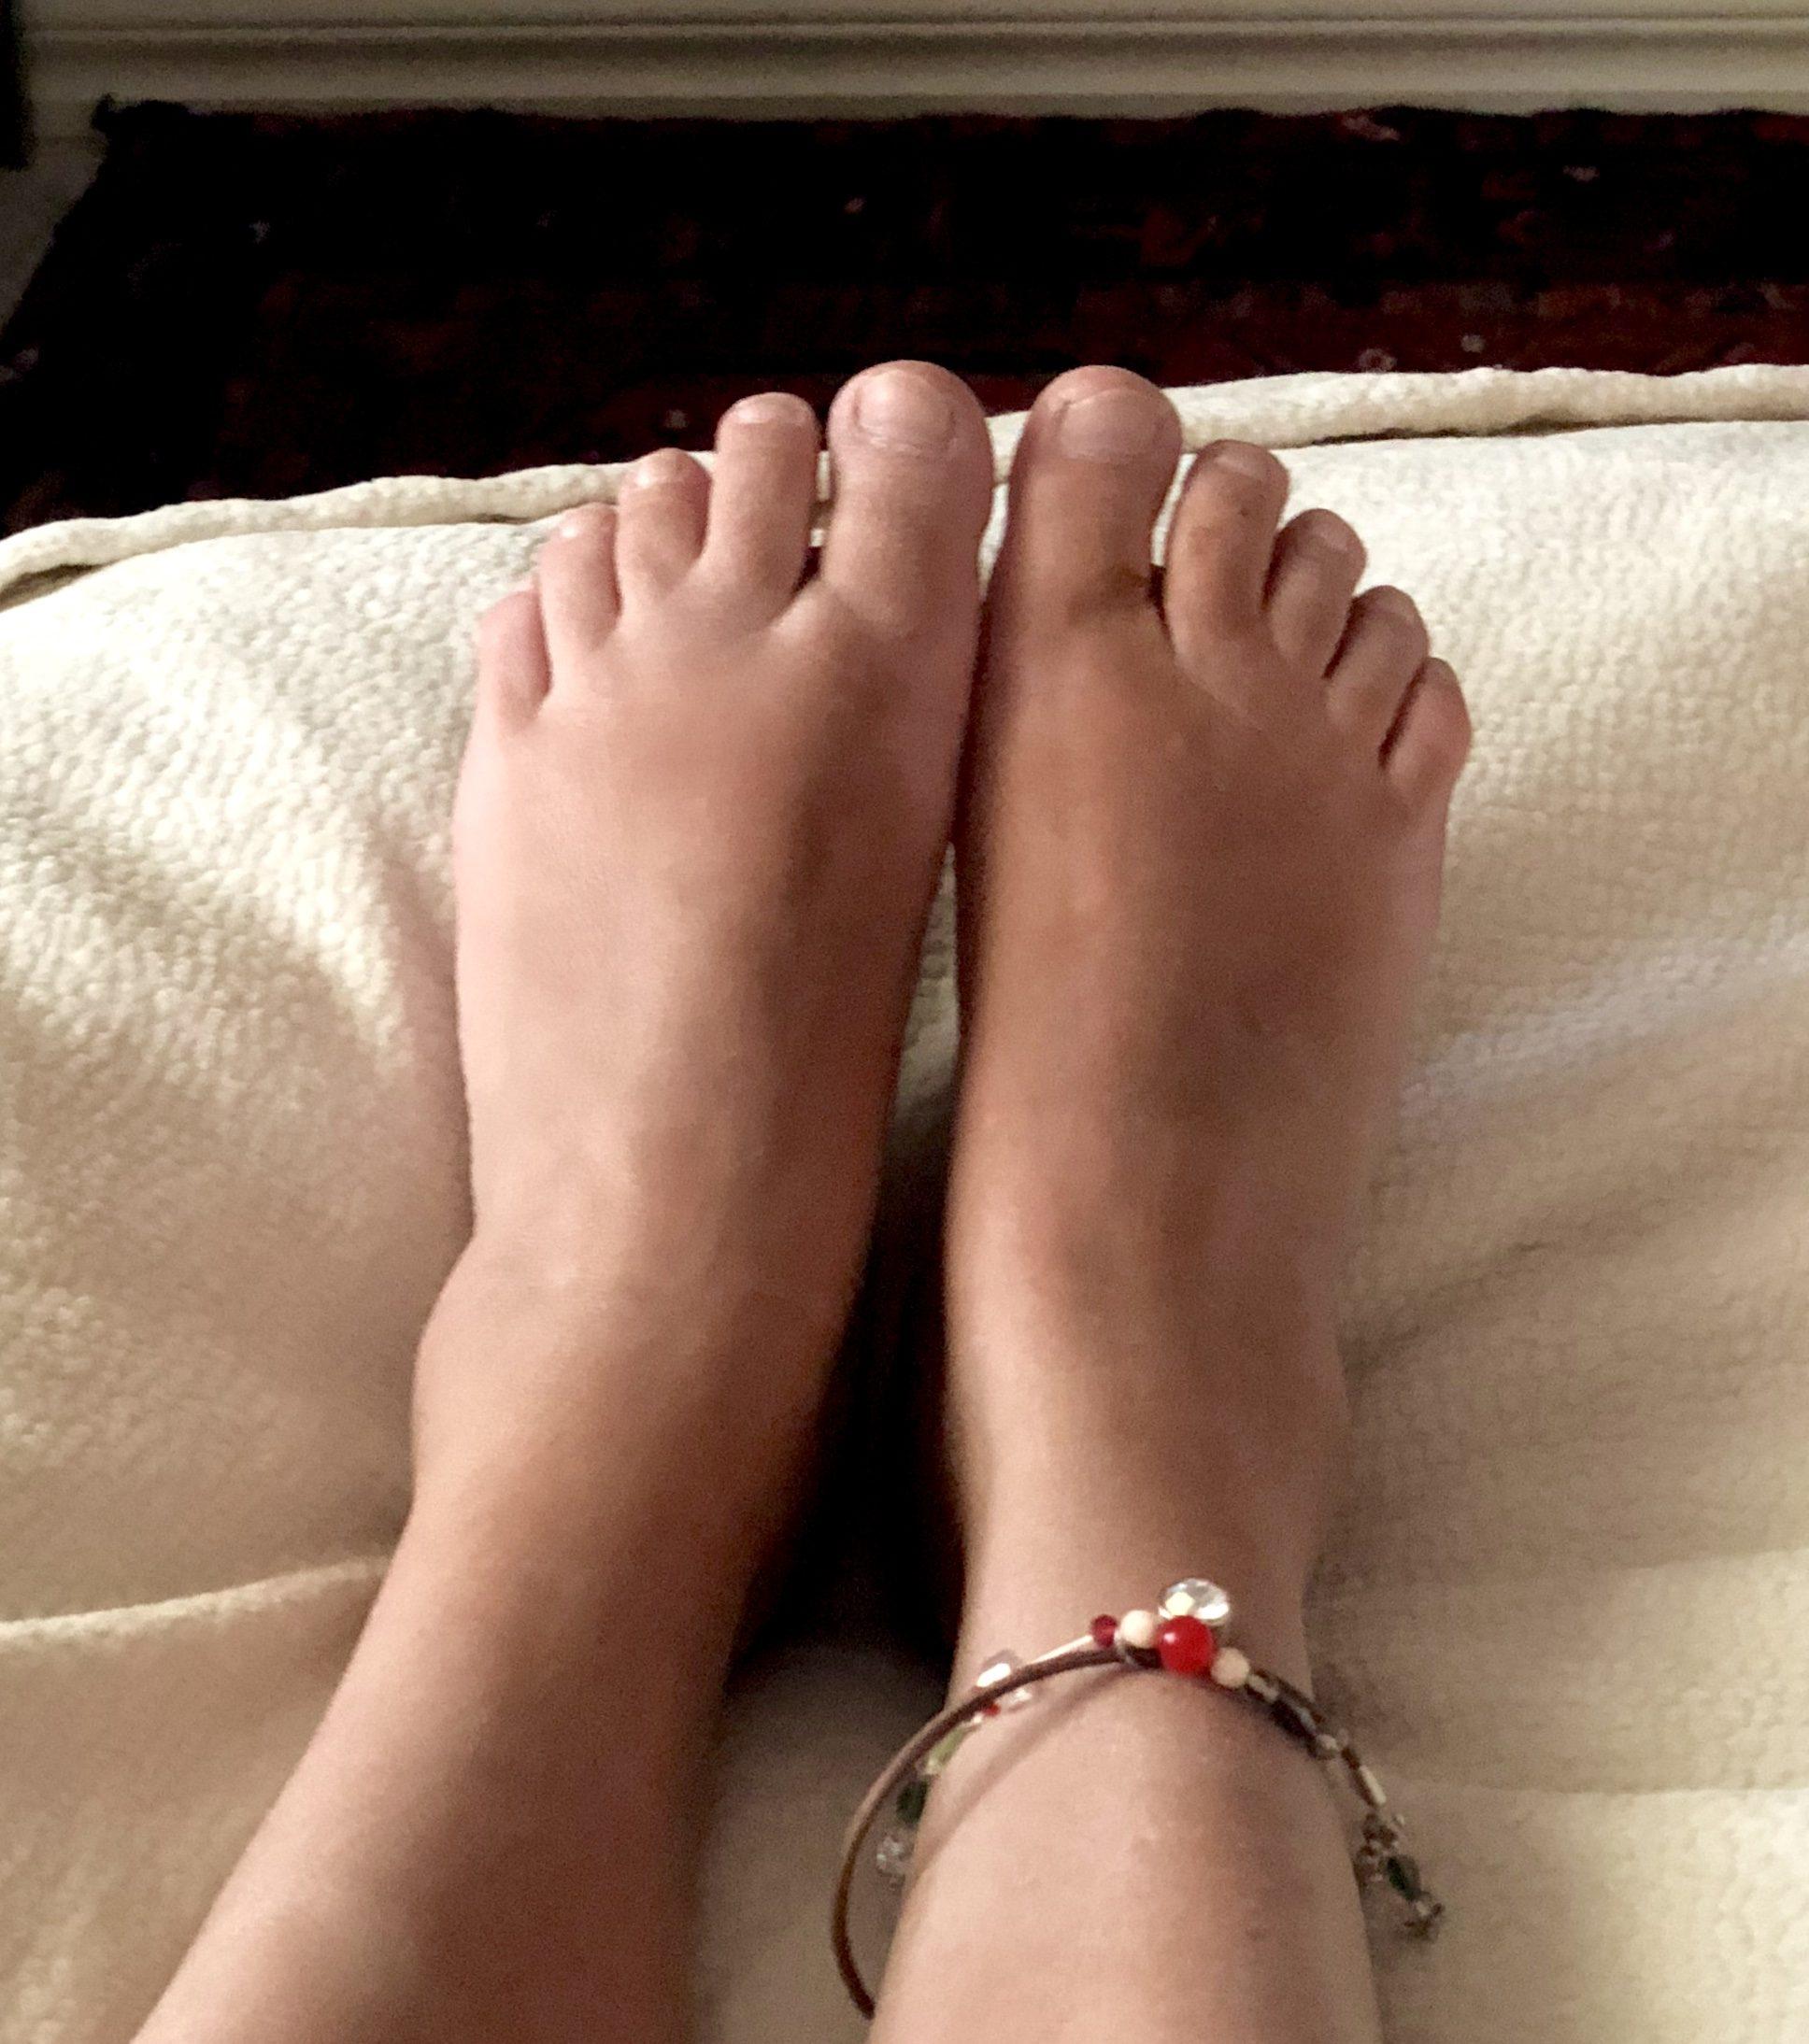 Mina fotspår